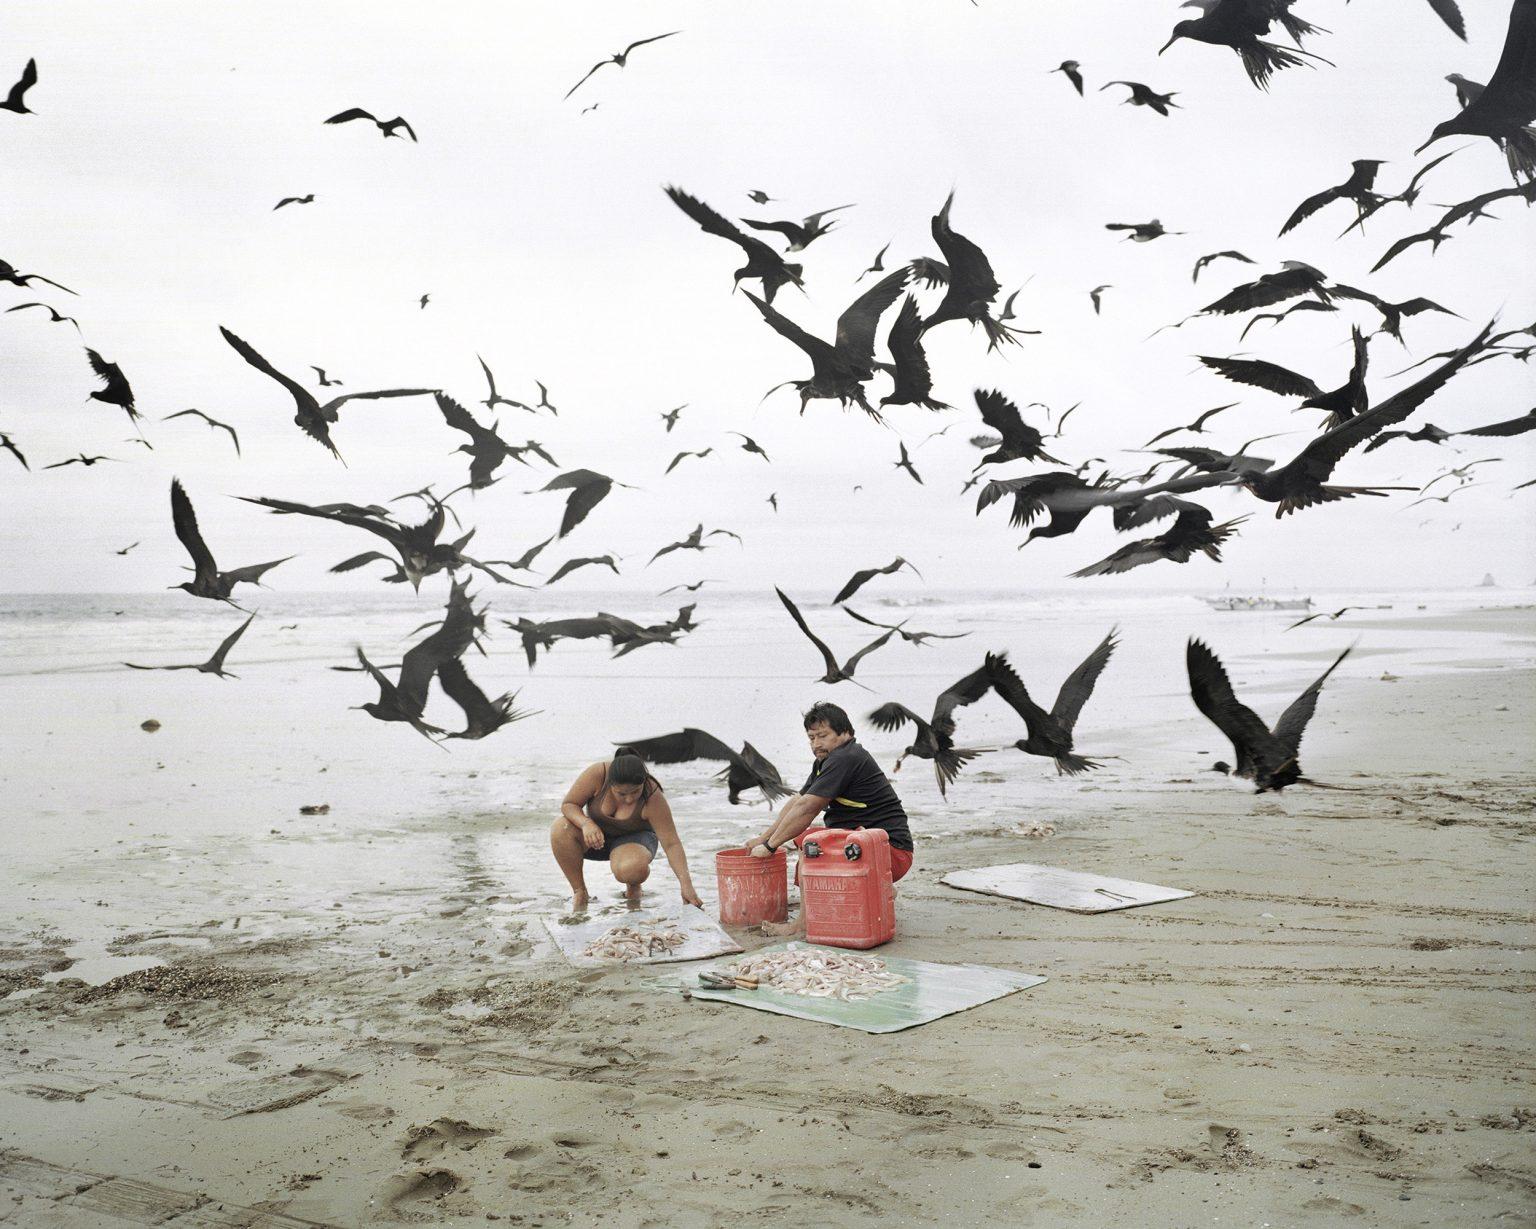 Un pescatore pulisce il pesce insieme a sua moglie su una spiaggia di Manabì. Ottobre 2012.   A fisherman cleans the fish with his wife on a beach in Manabì. October 2012.